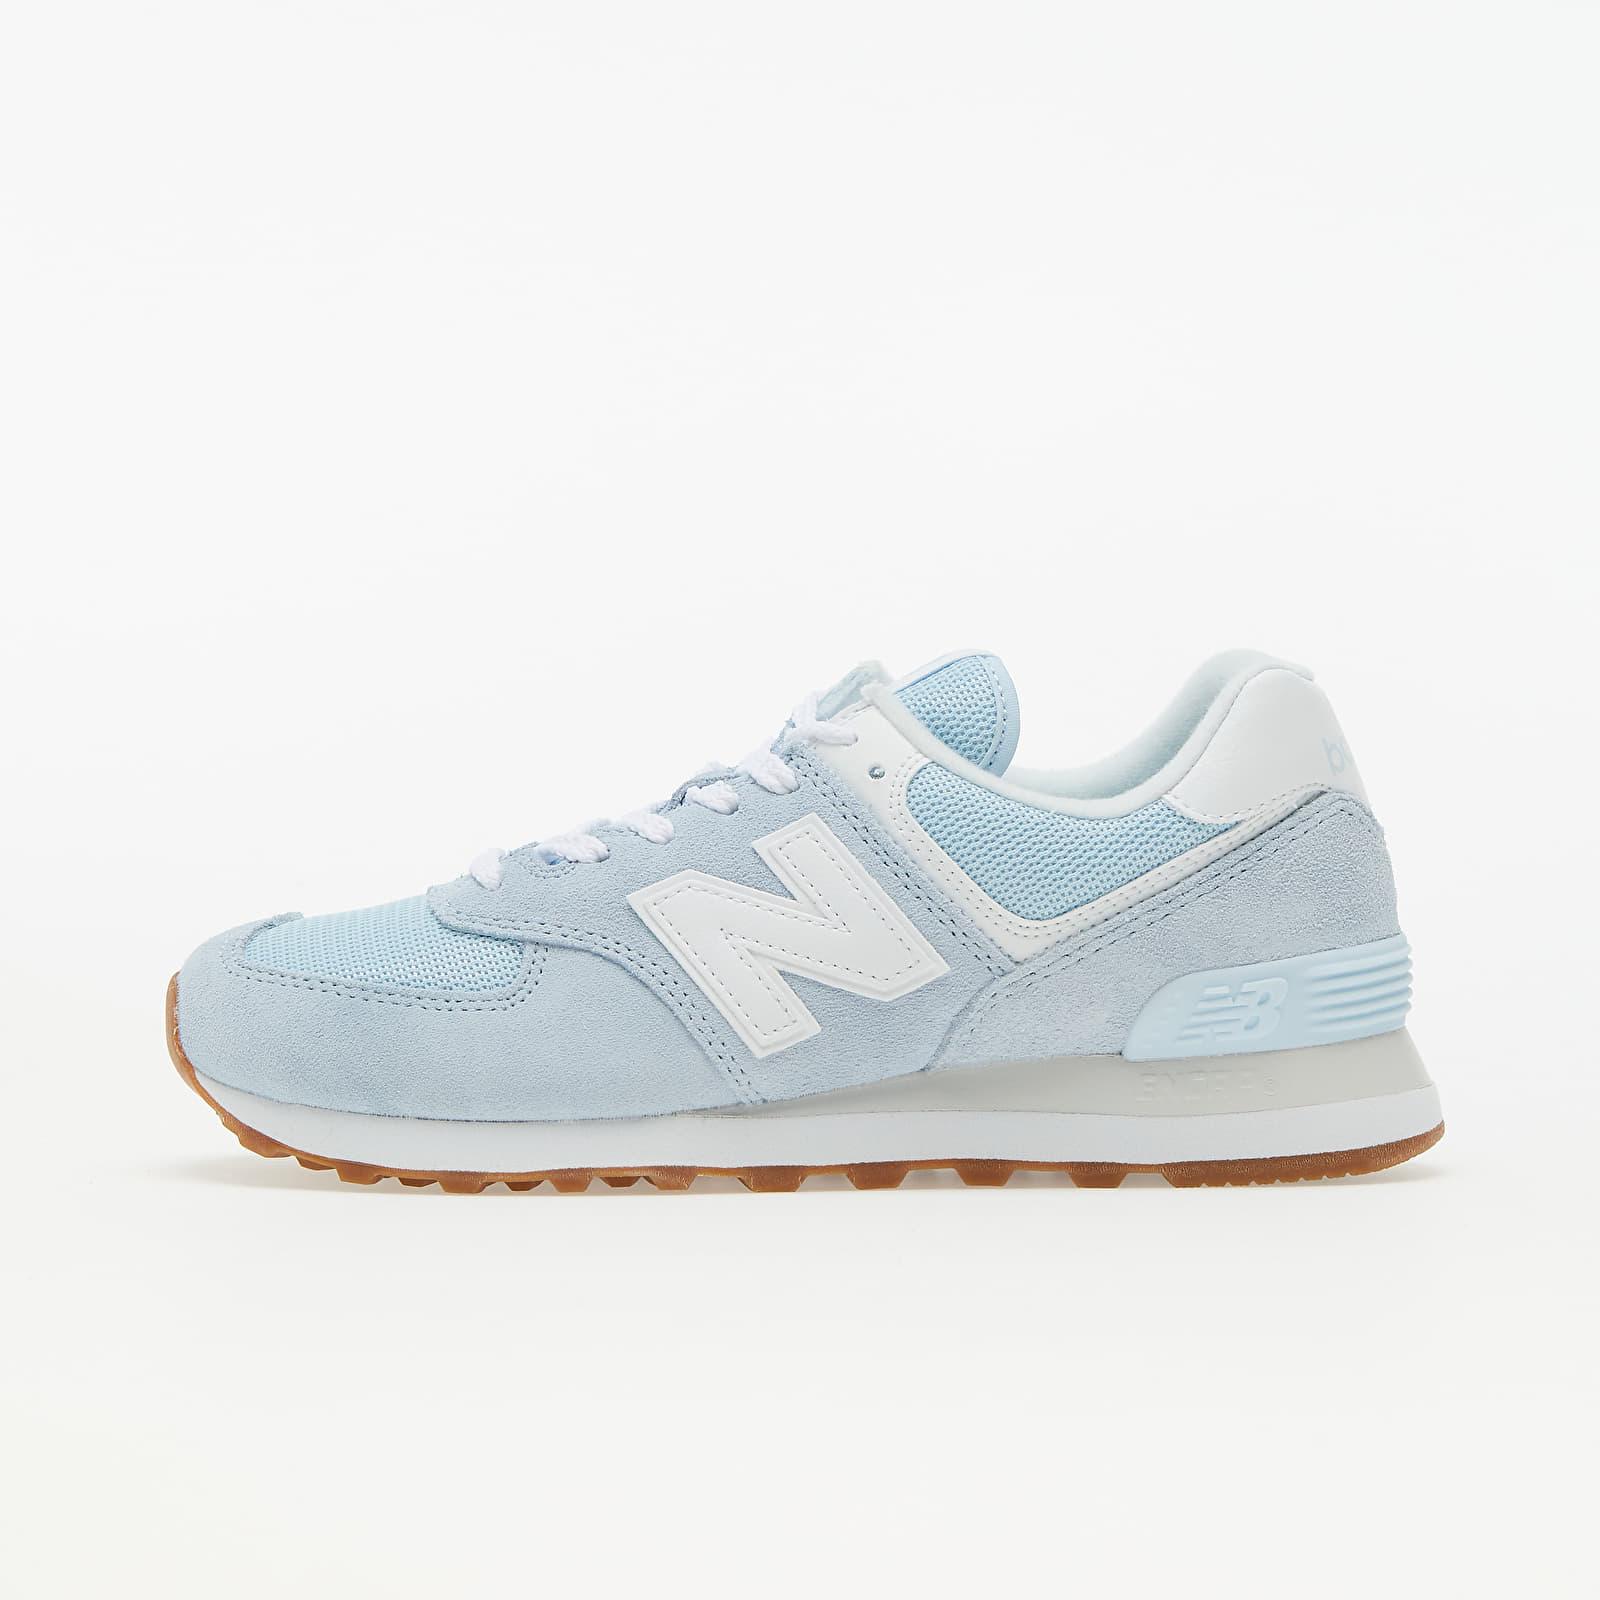 New Balance 574 Soft Blue EUR 39